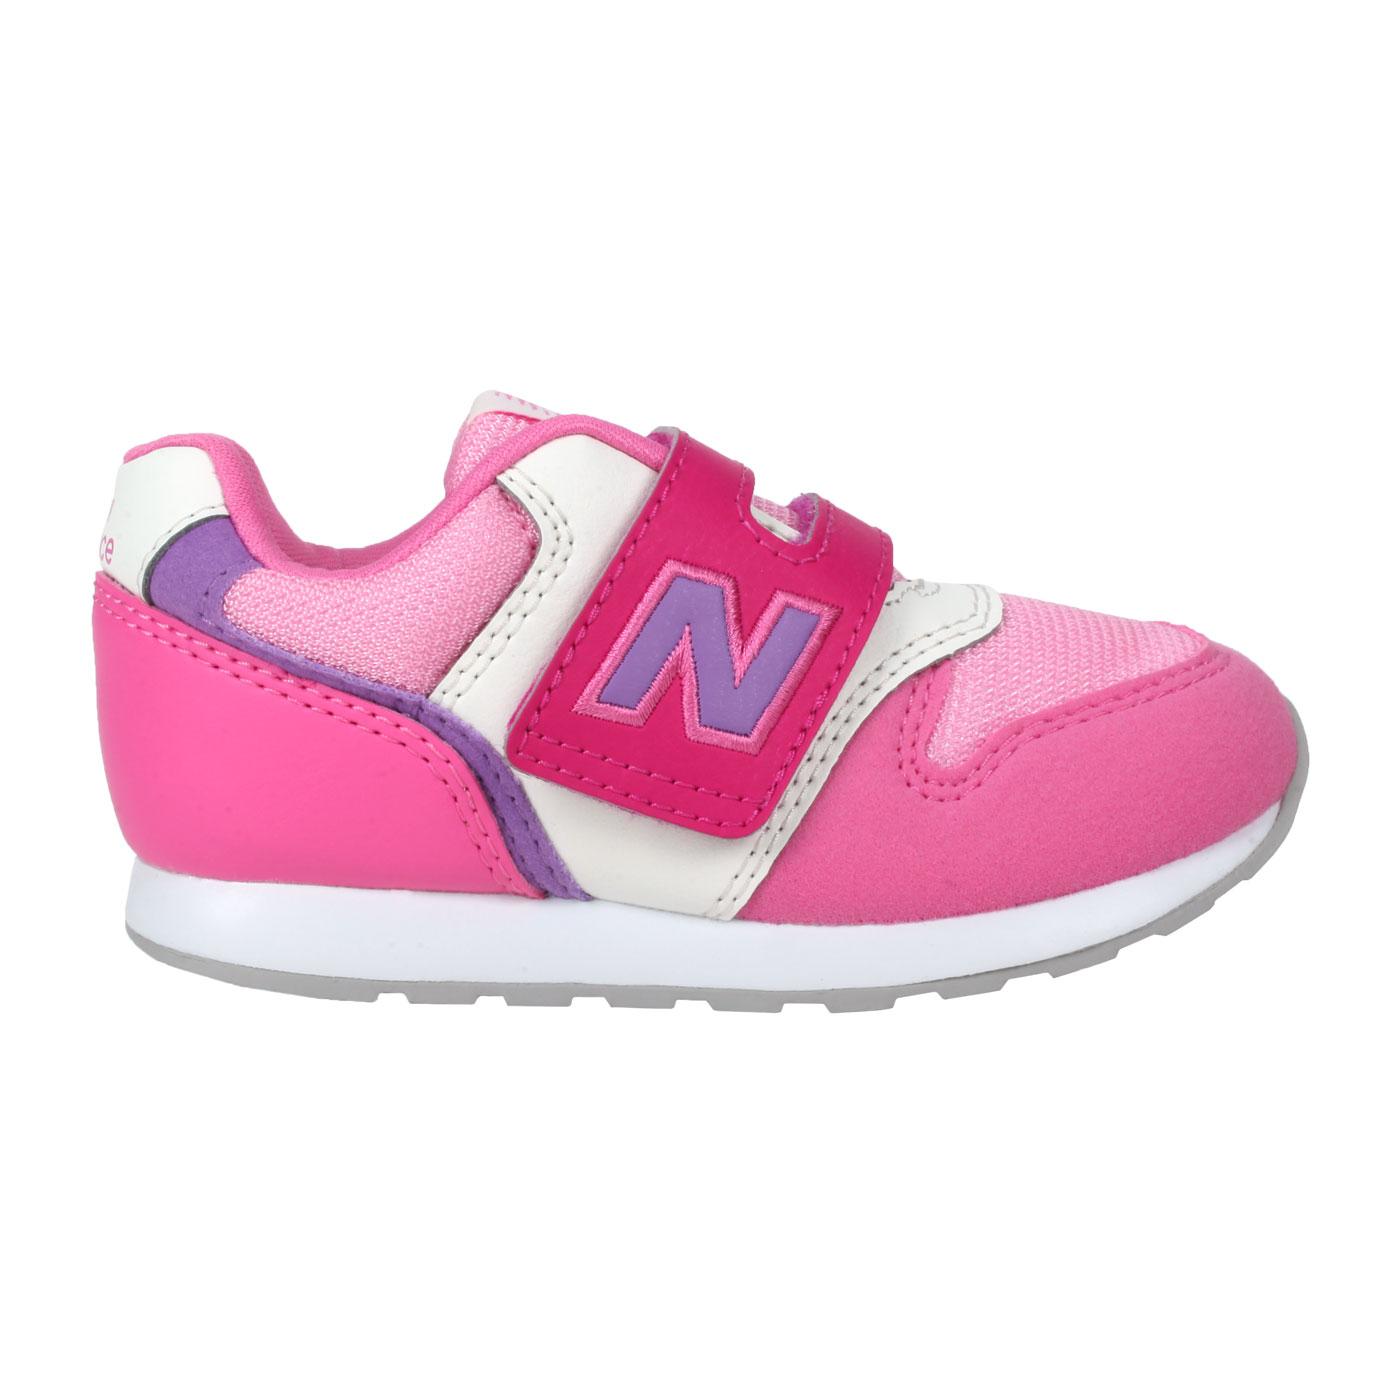 NEW BALANCE 小童休閒運動鞋-WIDE IZ996MPP - 桃紅紫